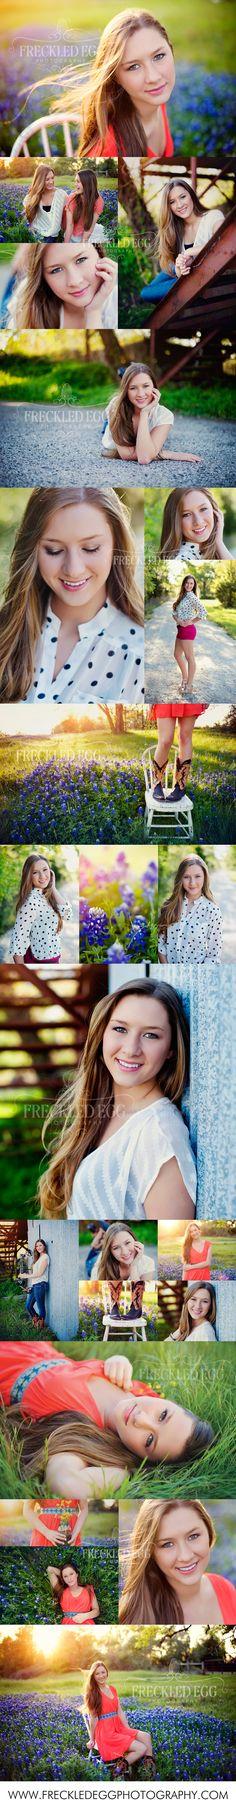 Senior Spring Photos, and Posing.